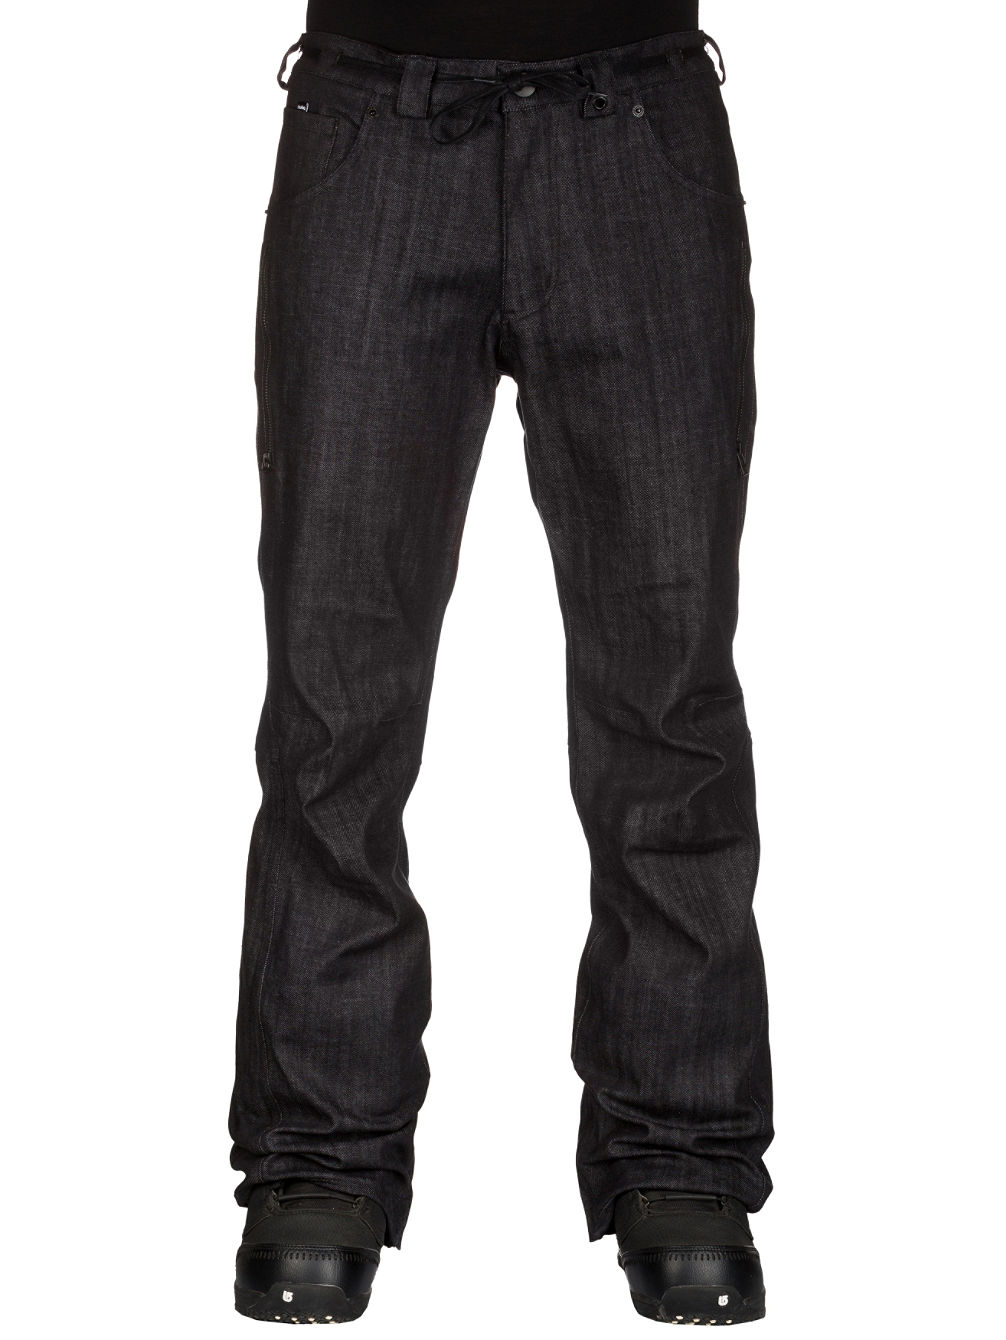 analog-remer-pants